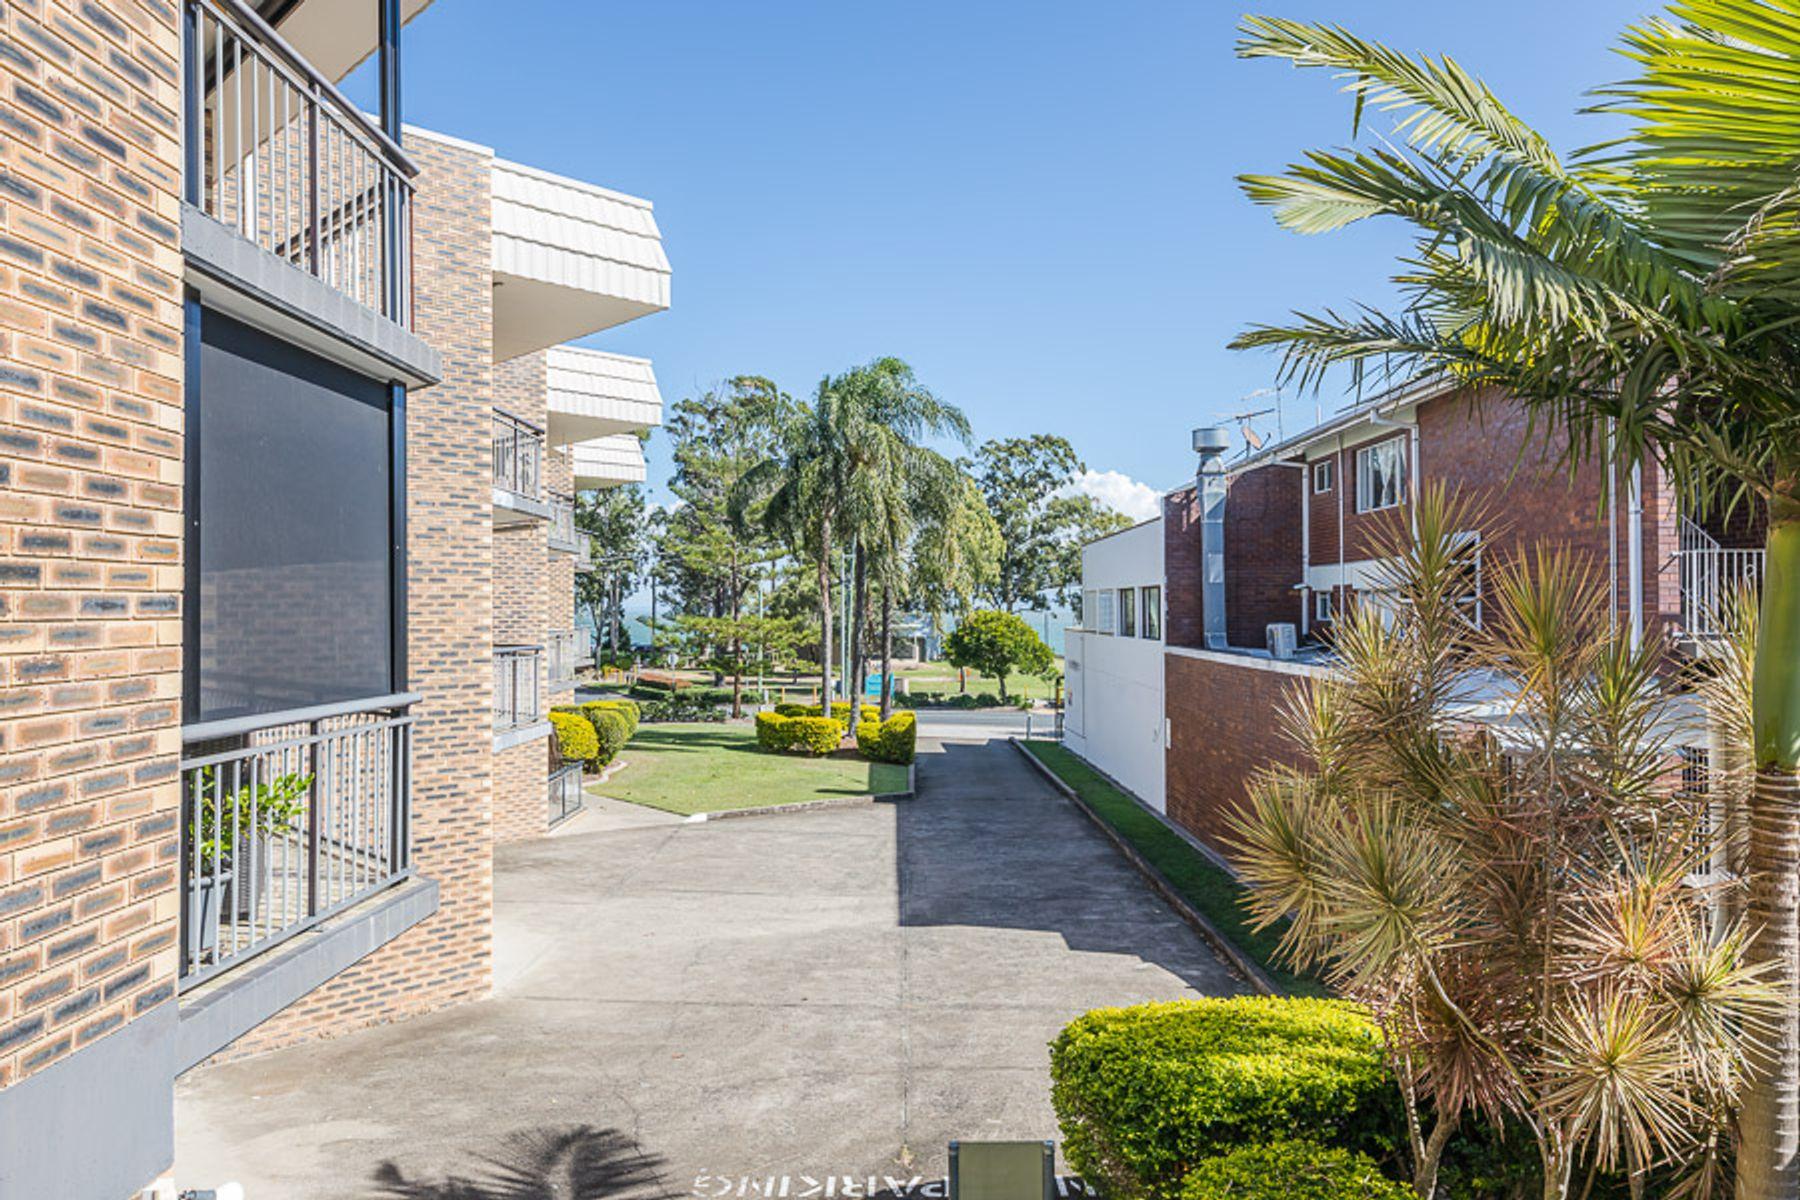 3/15-19 Toorbul Street, Bongaree, QLD 4507